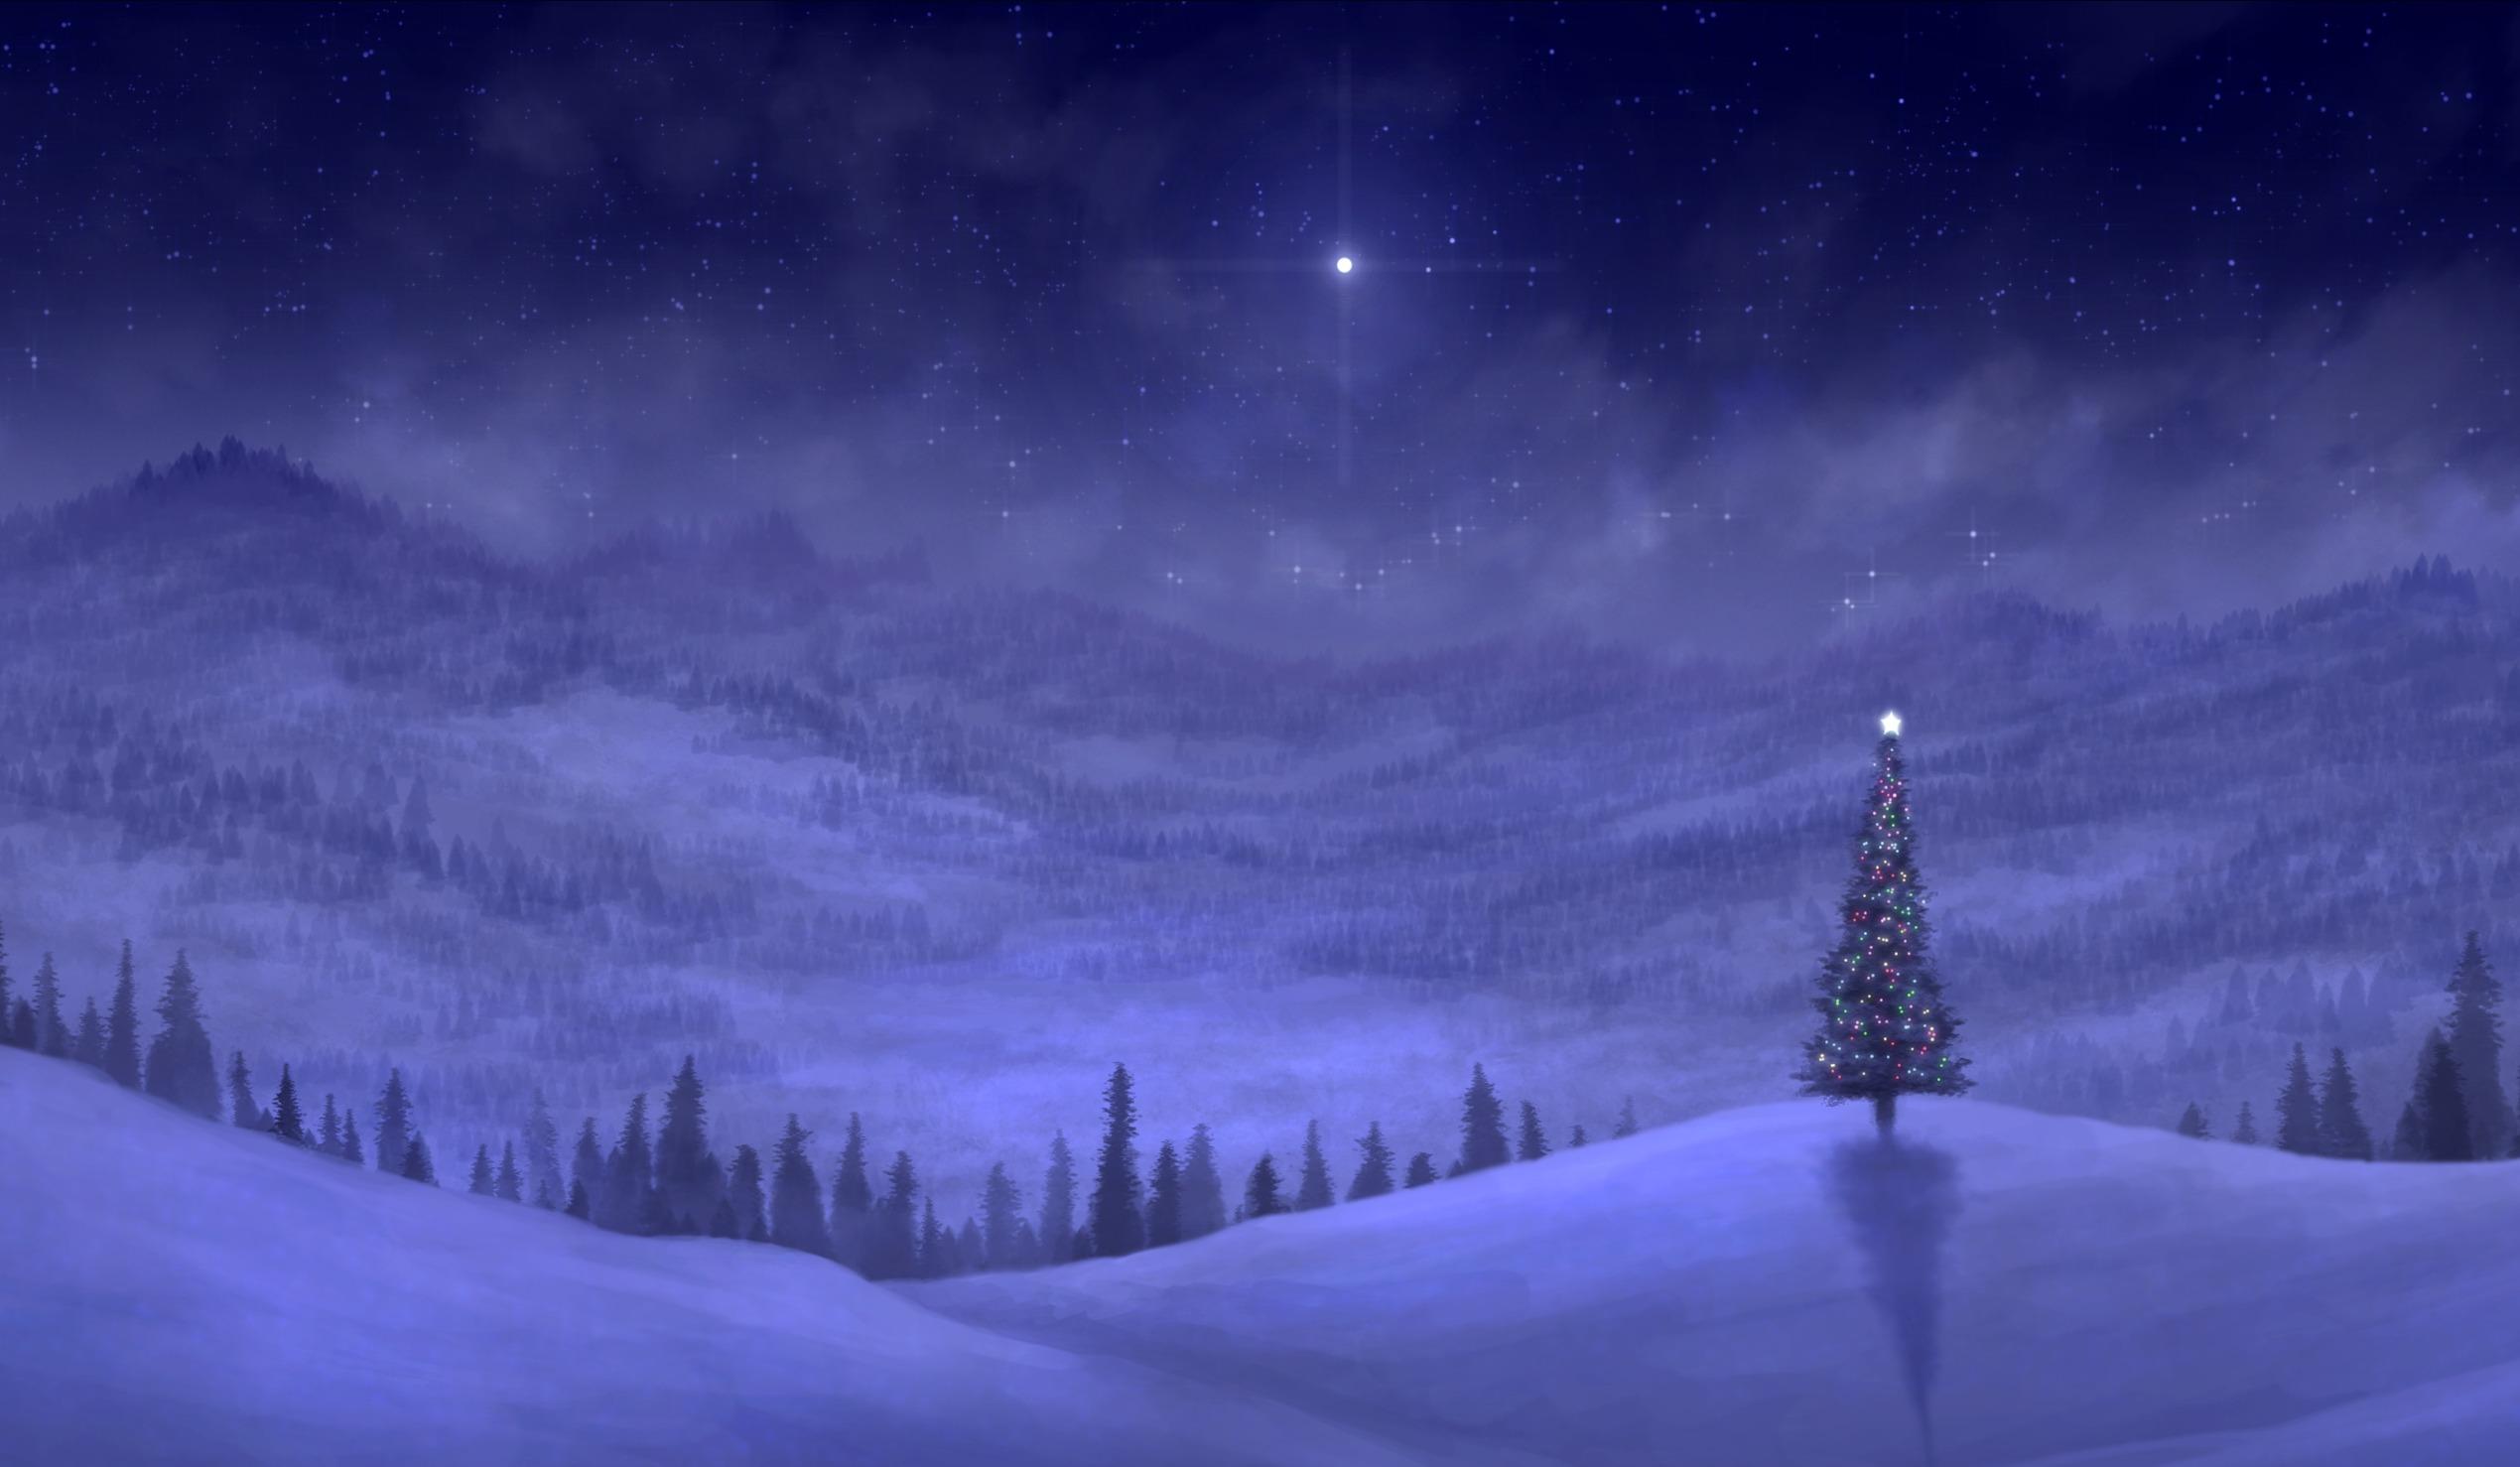 Night lights holiday -  Wallpaper Save It